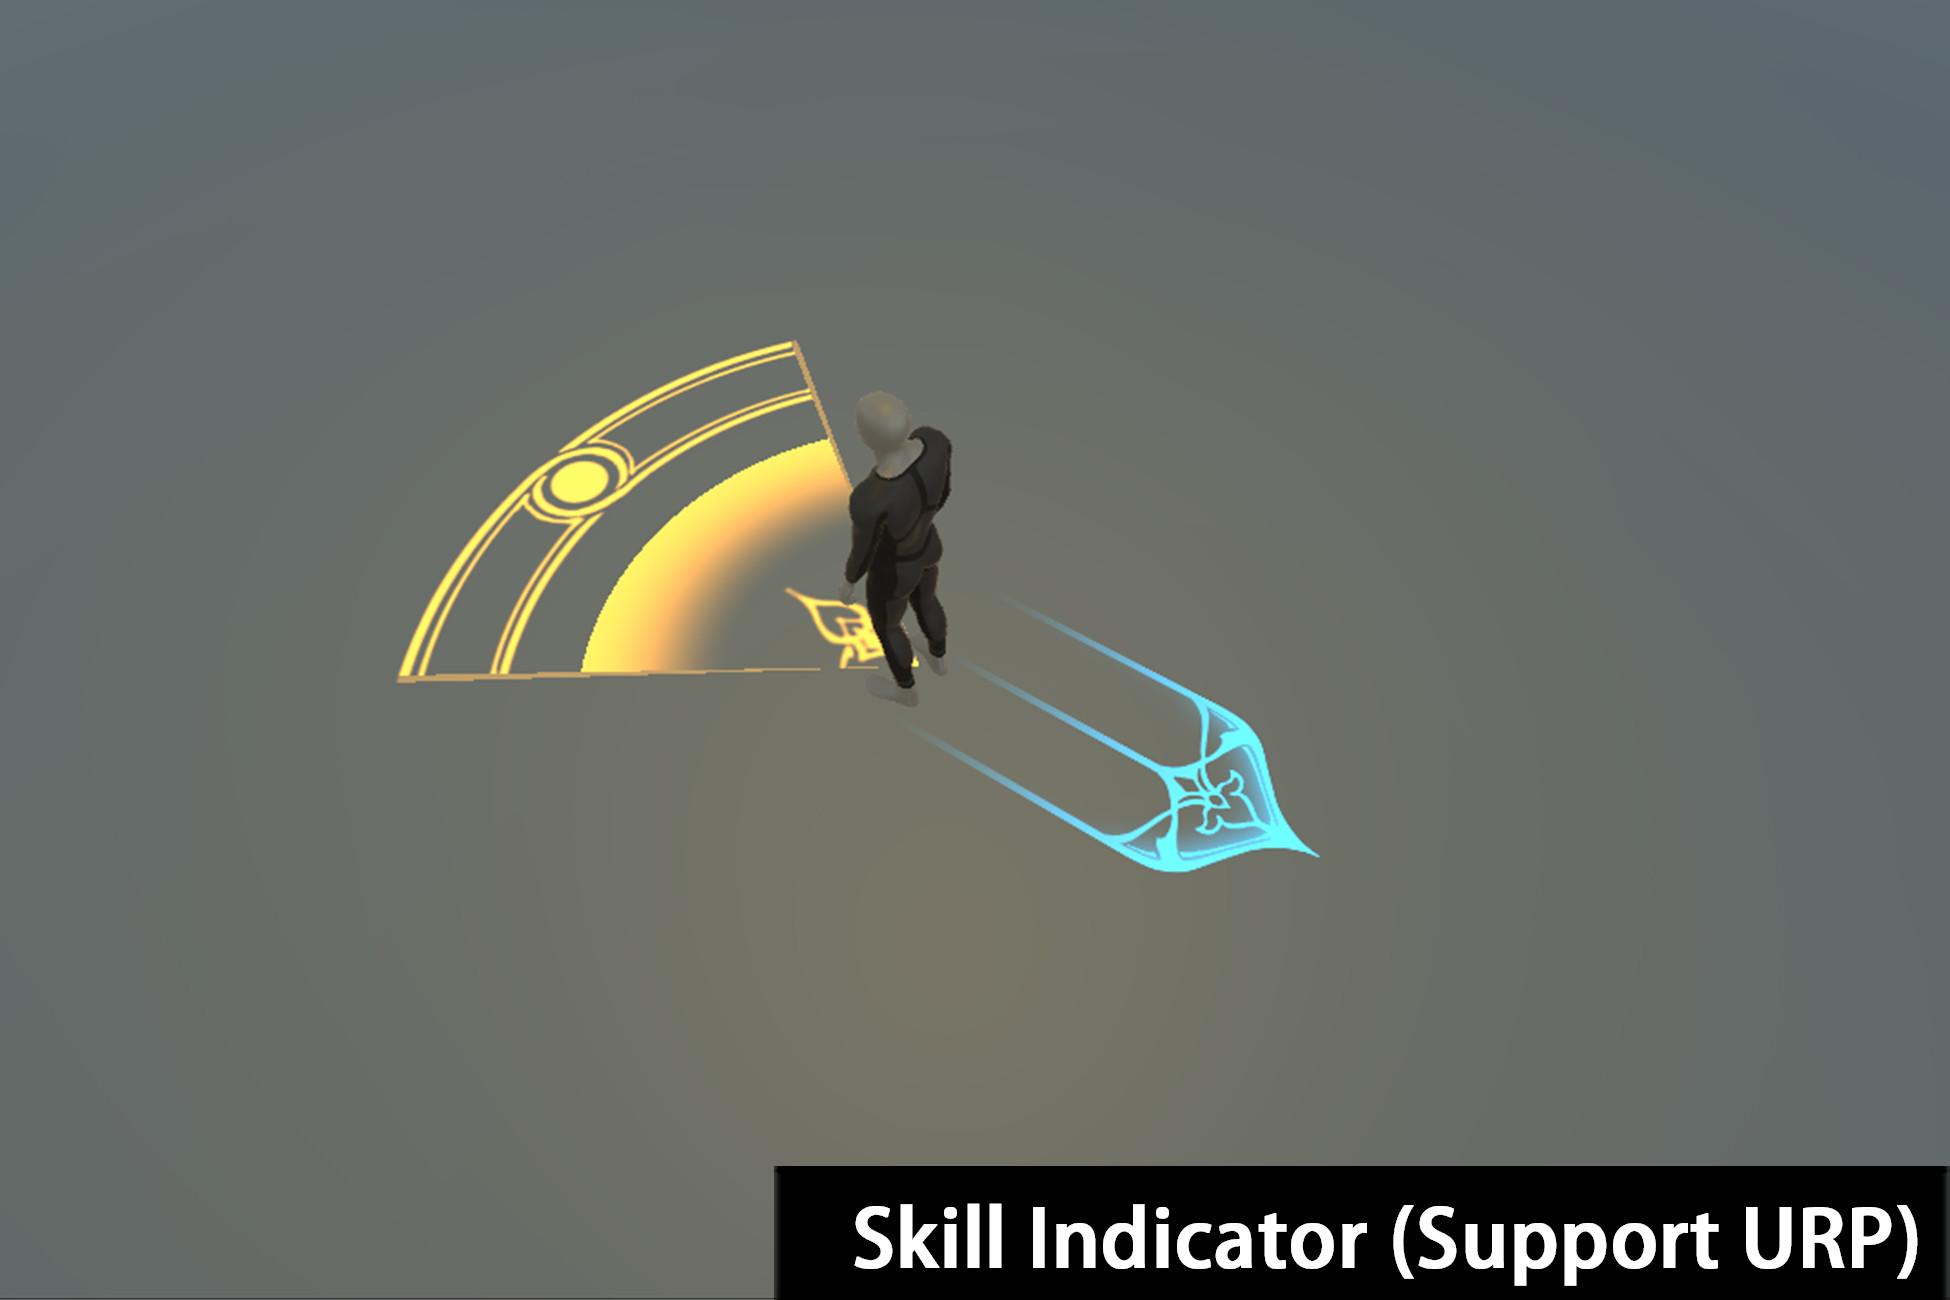 Skill Indicator